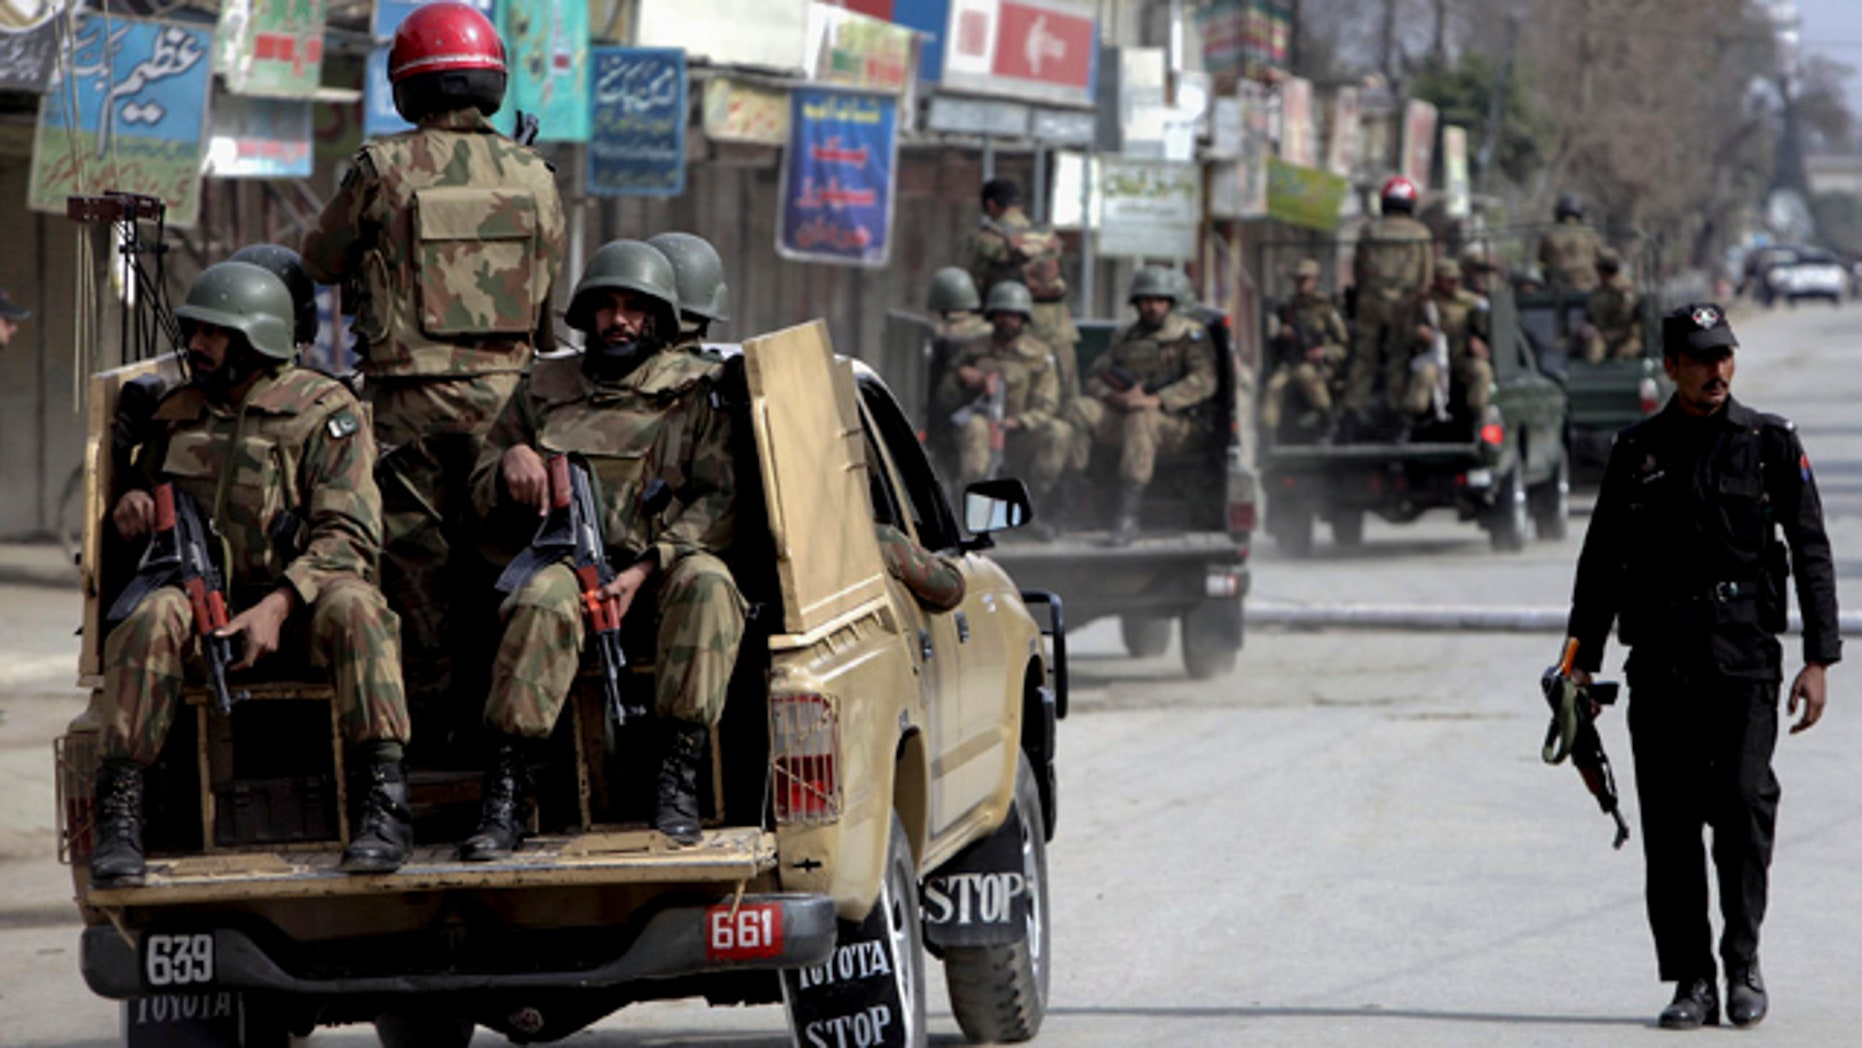 Feb. 10: Pakistan army soldiers patrol in the vicinity of the army training camp in Mardan near Peshawar, Pakistan.